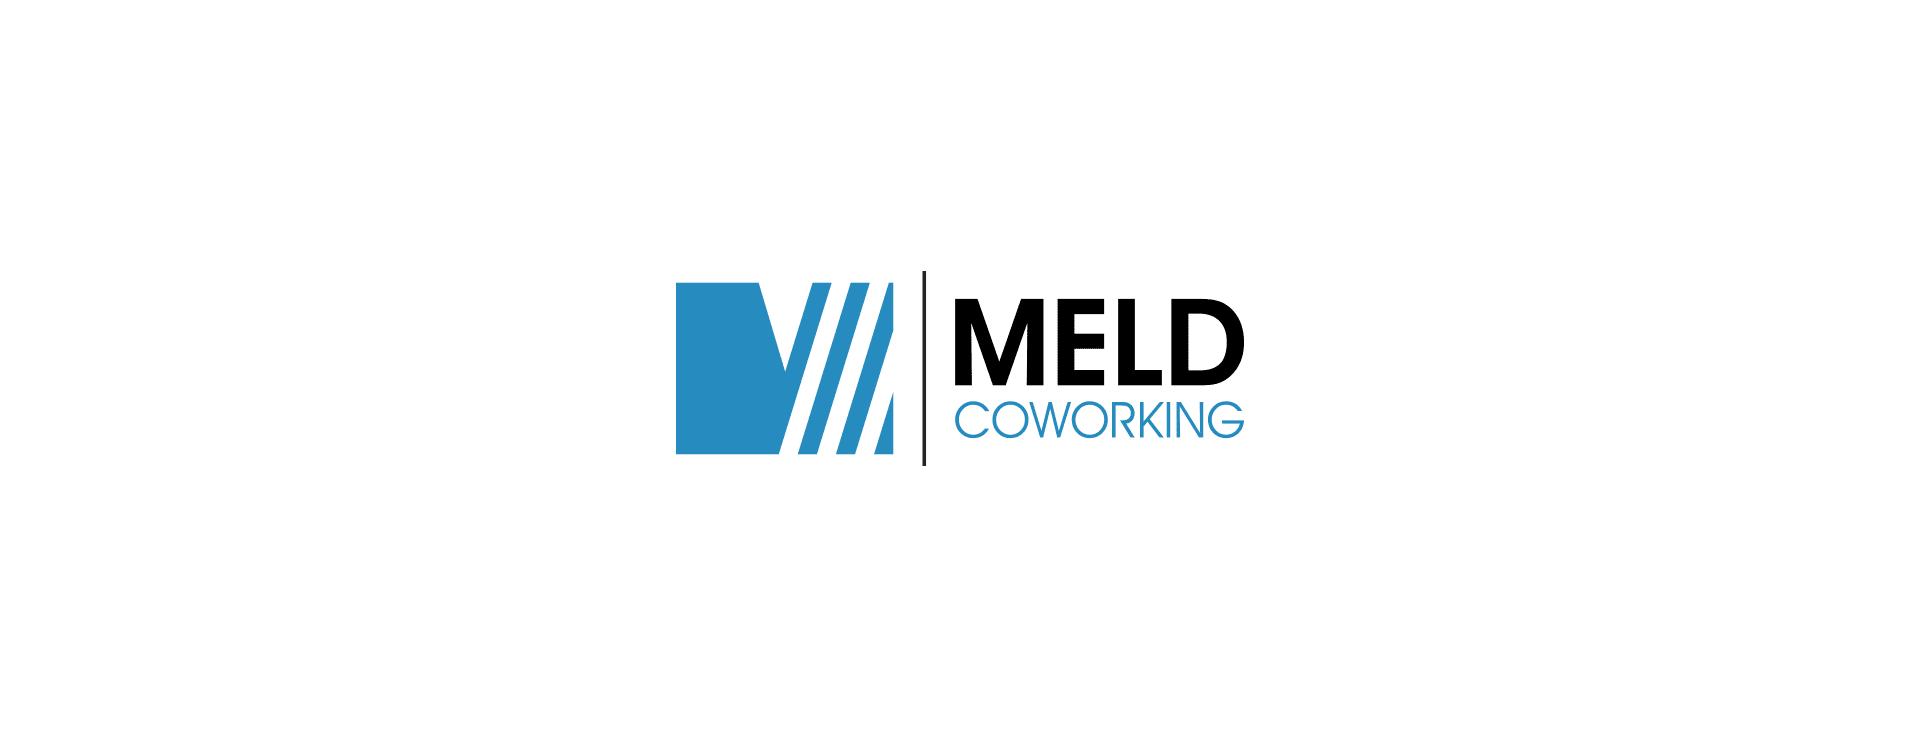 Logo Design - MELD Coworking